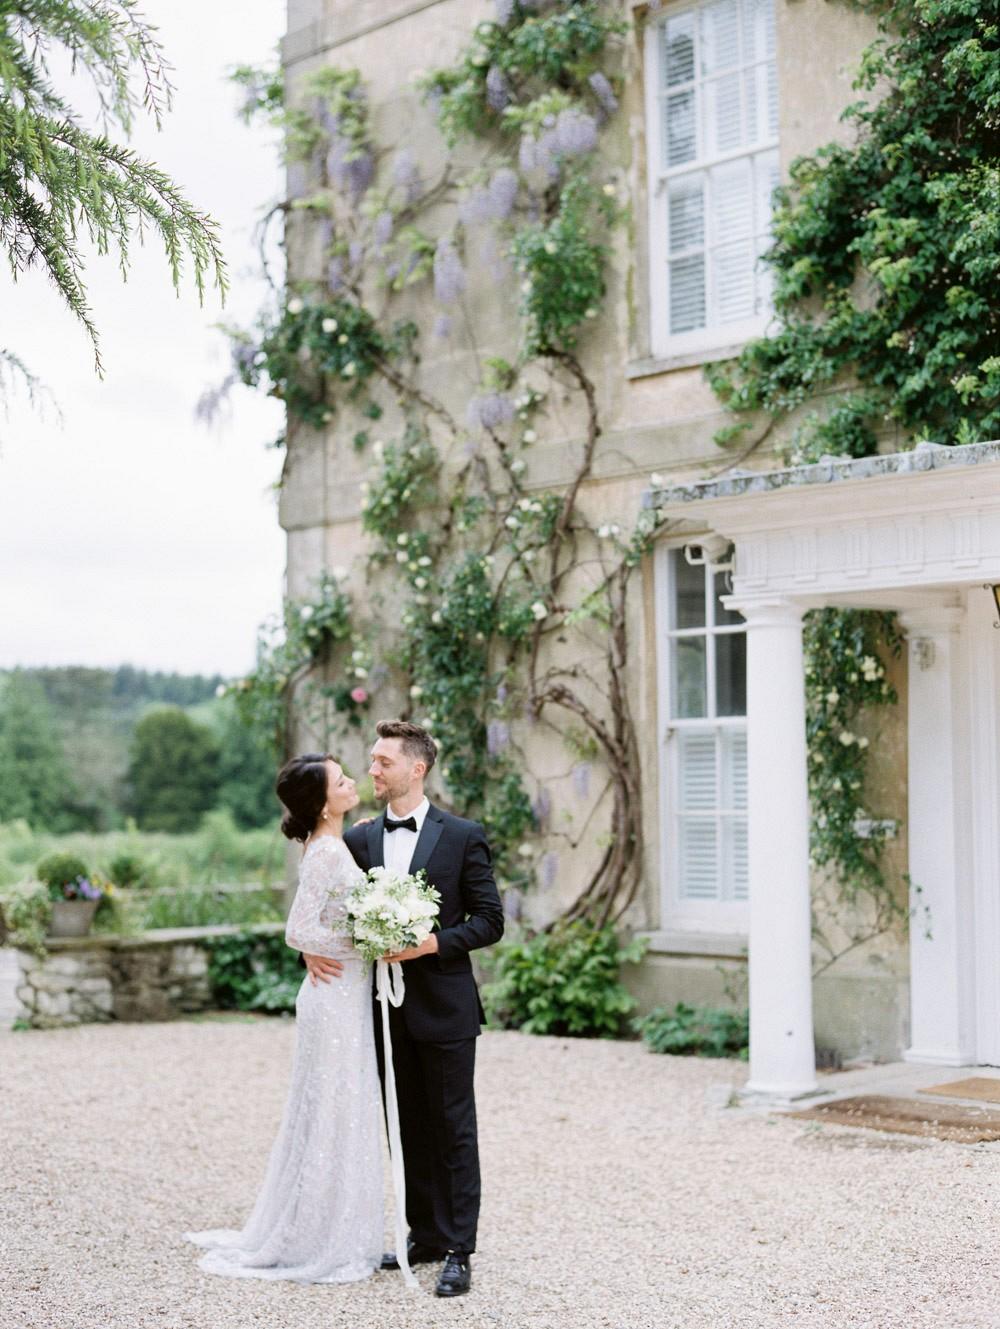 A relaxed, yet elegant English garden wedding